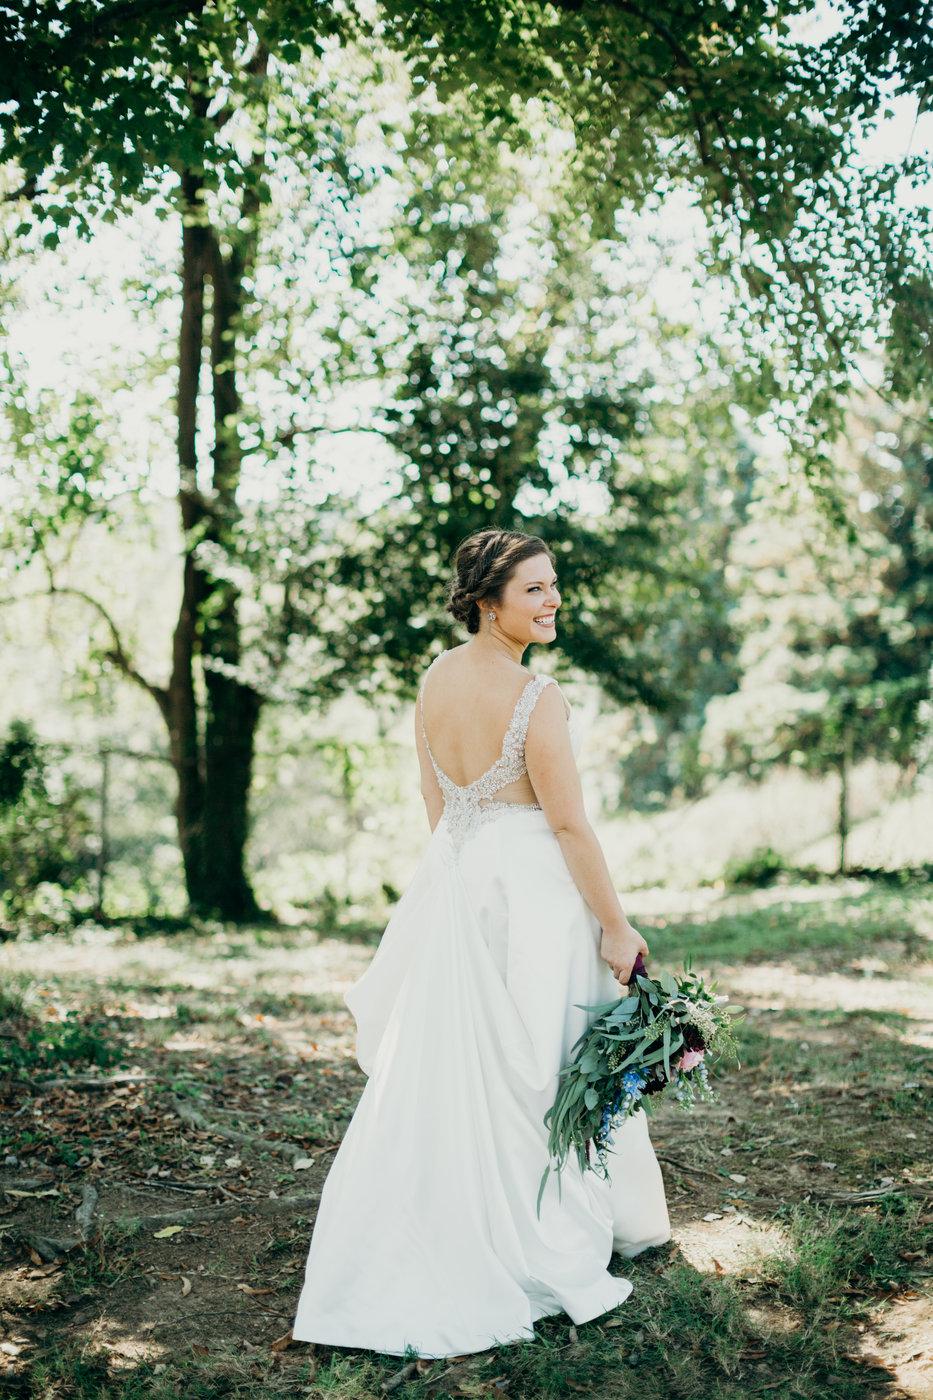 Ryan Jessica-Bride Groom-0140.jpg